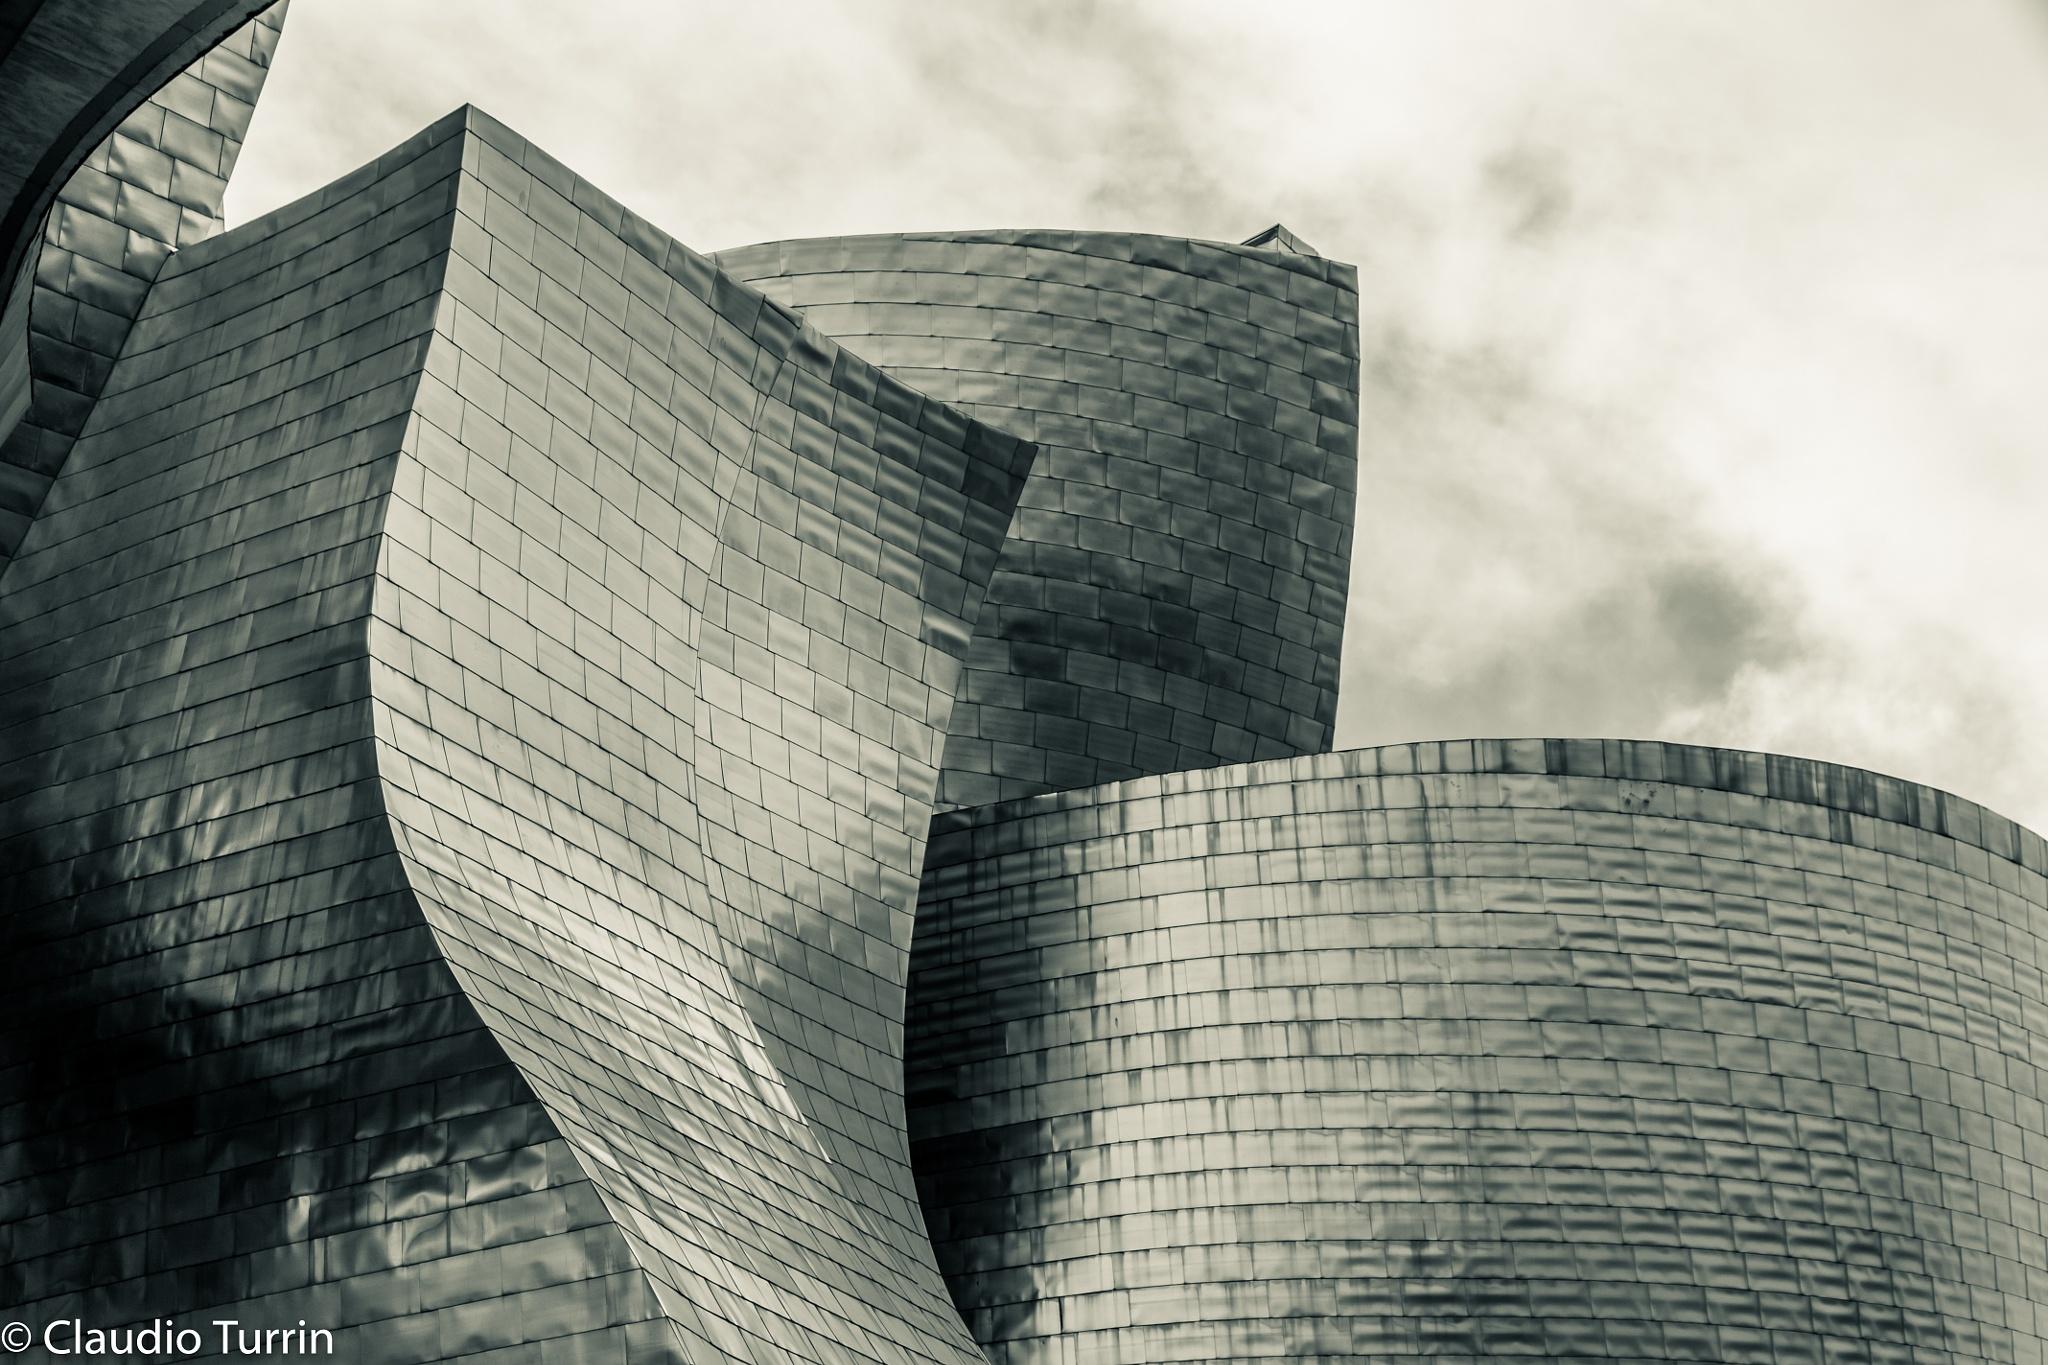 Bilbao Guggenheim Museum by claudioturrin77